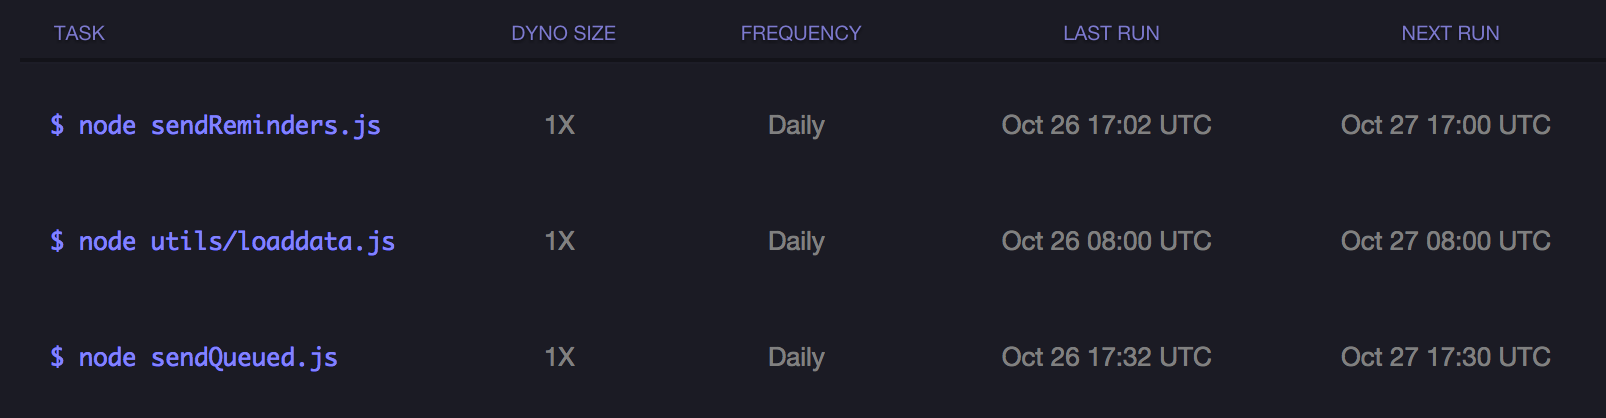 scheduler settings